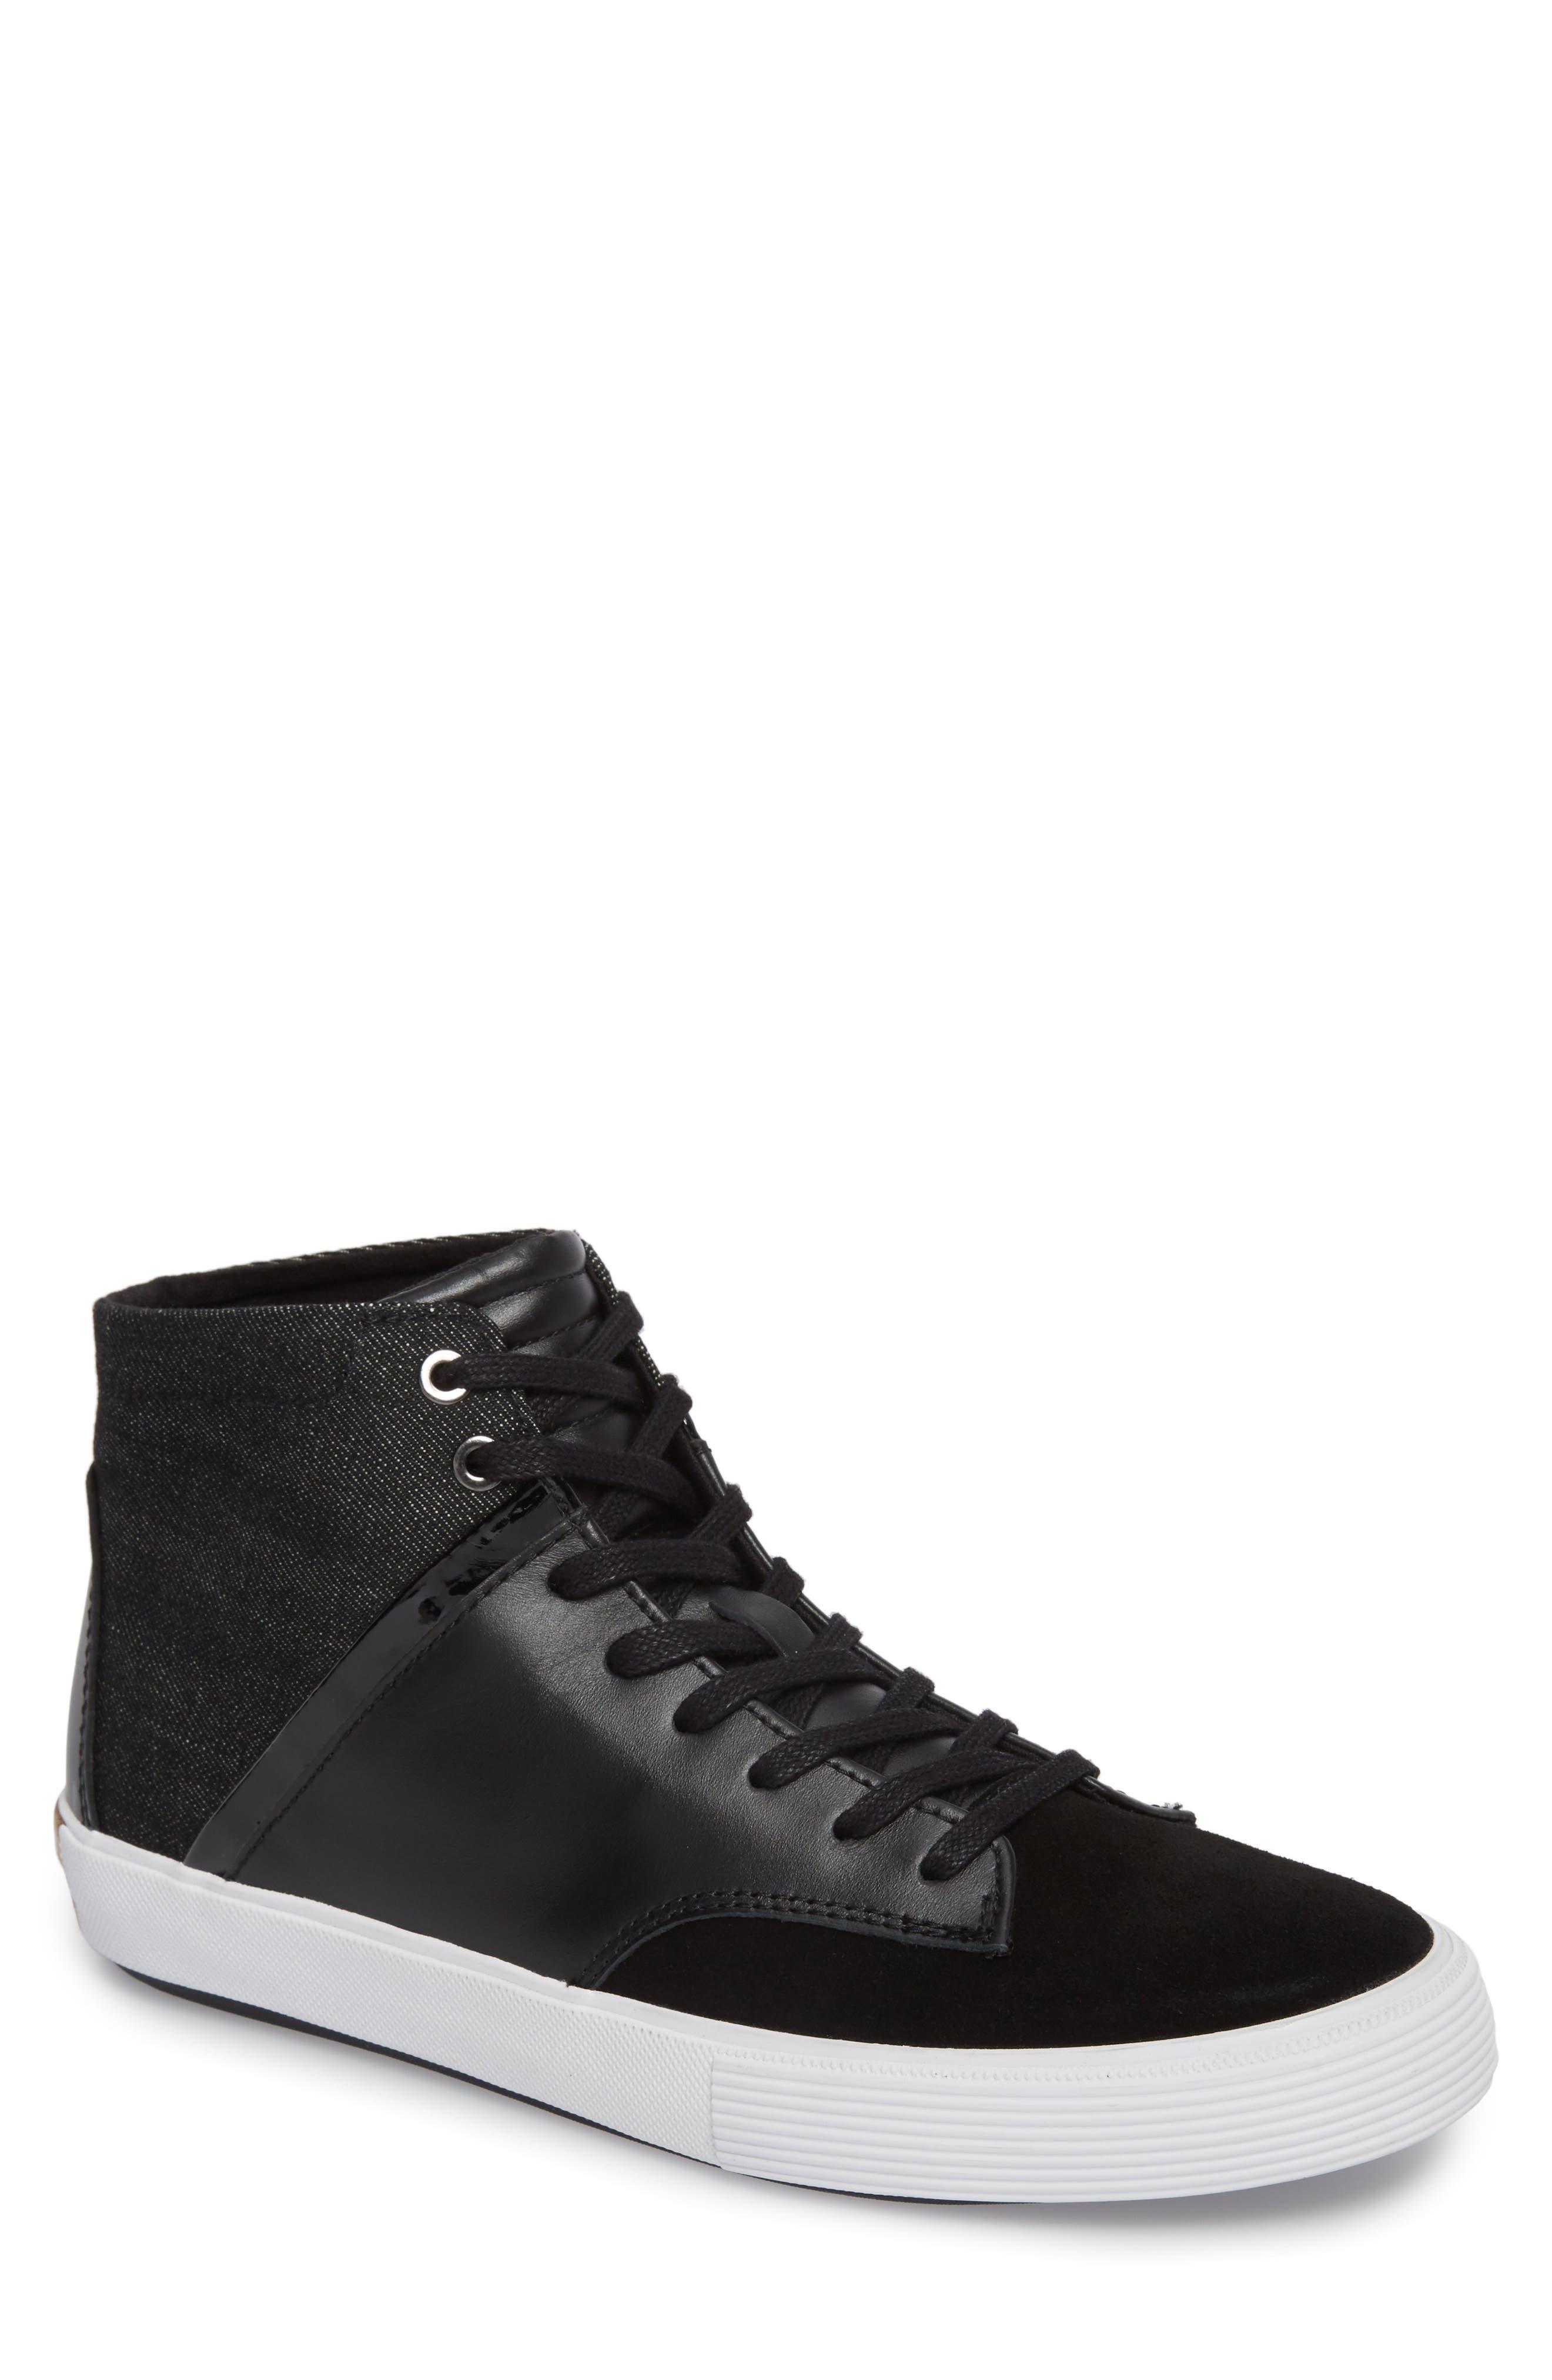 Joe Mac High Top Sneaker,                             Main thumbnail 1, color,                             001